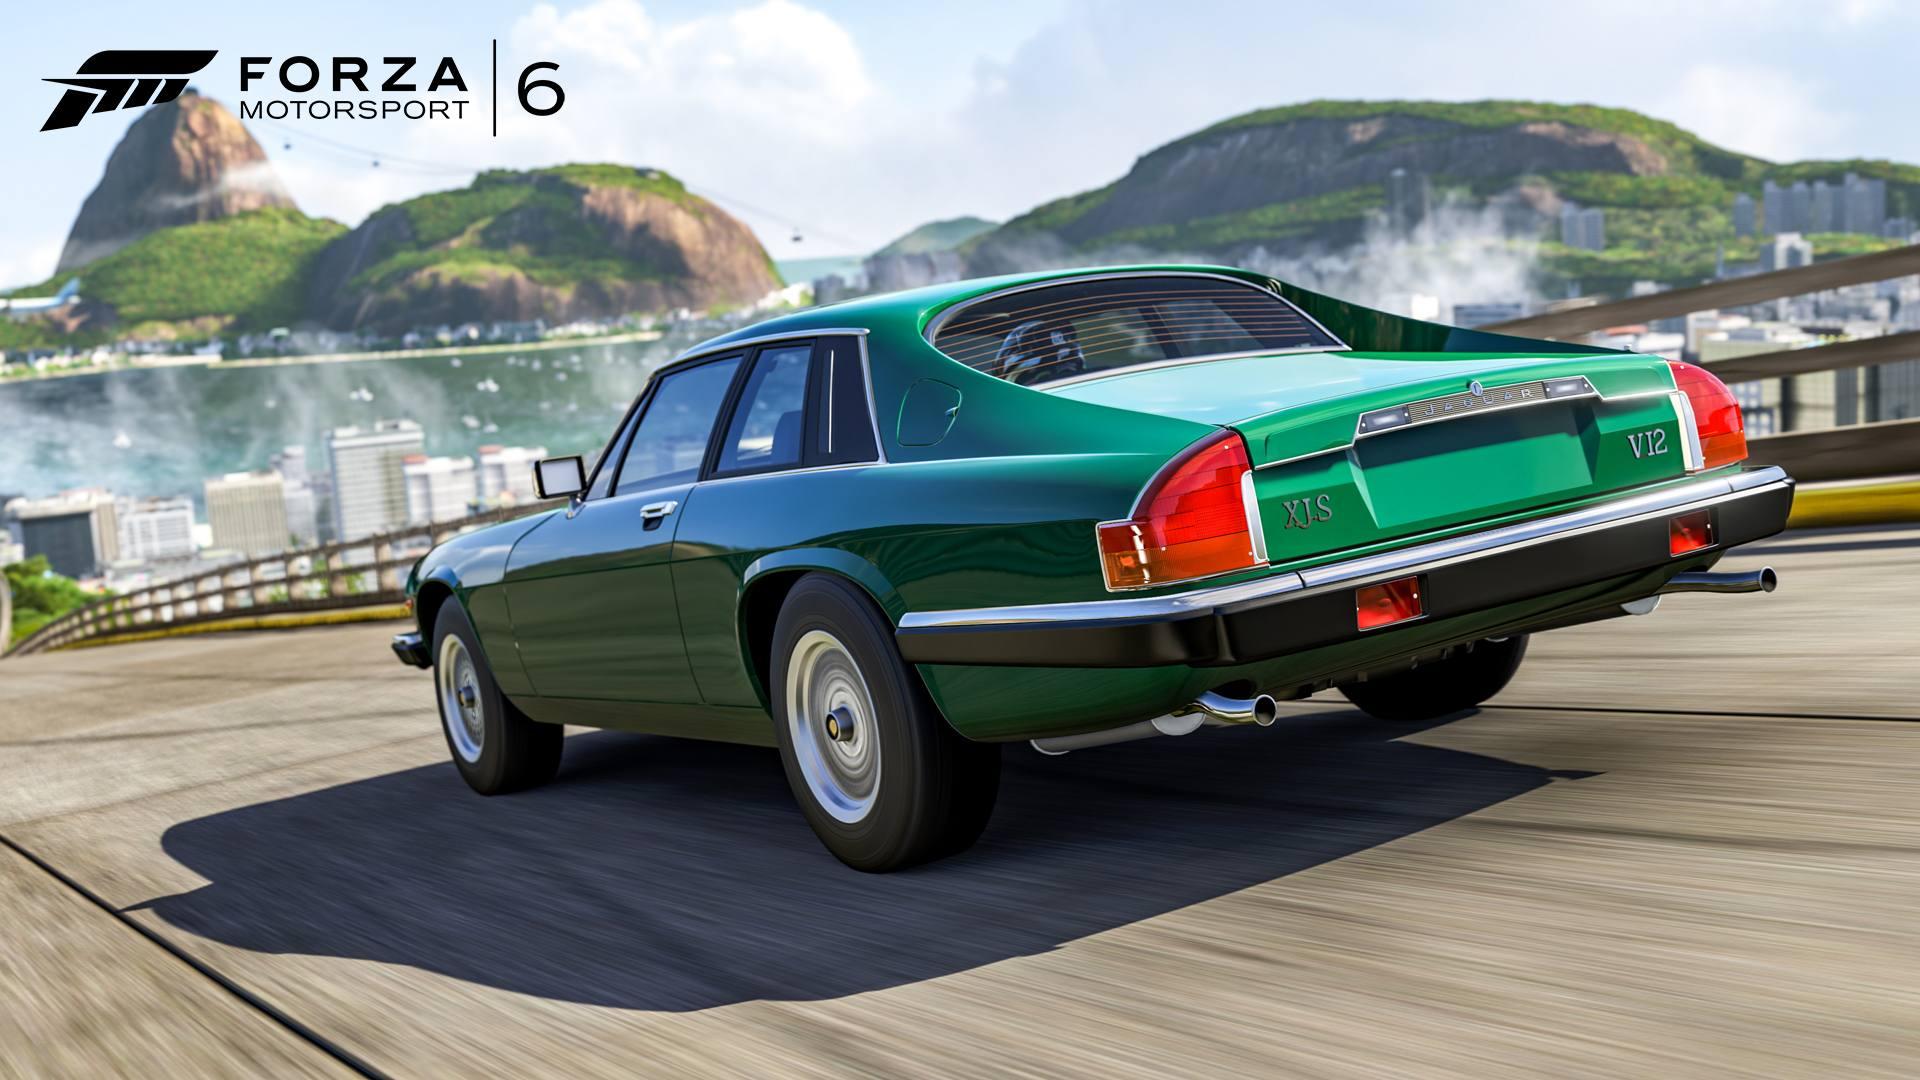 Forza Motorsport 6 1990 Jaguar XJ-S 05-04-16 001